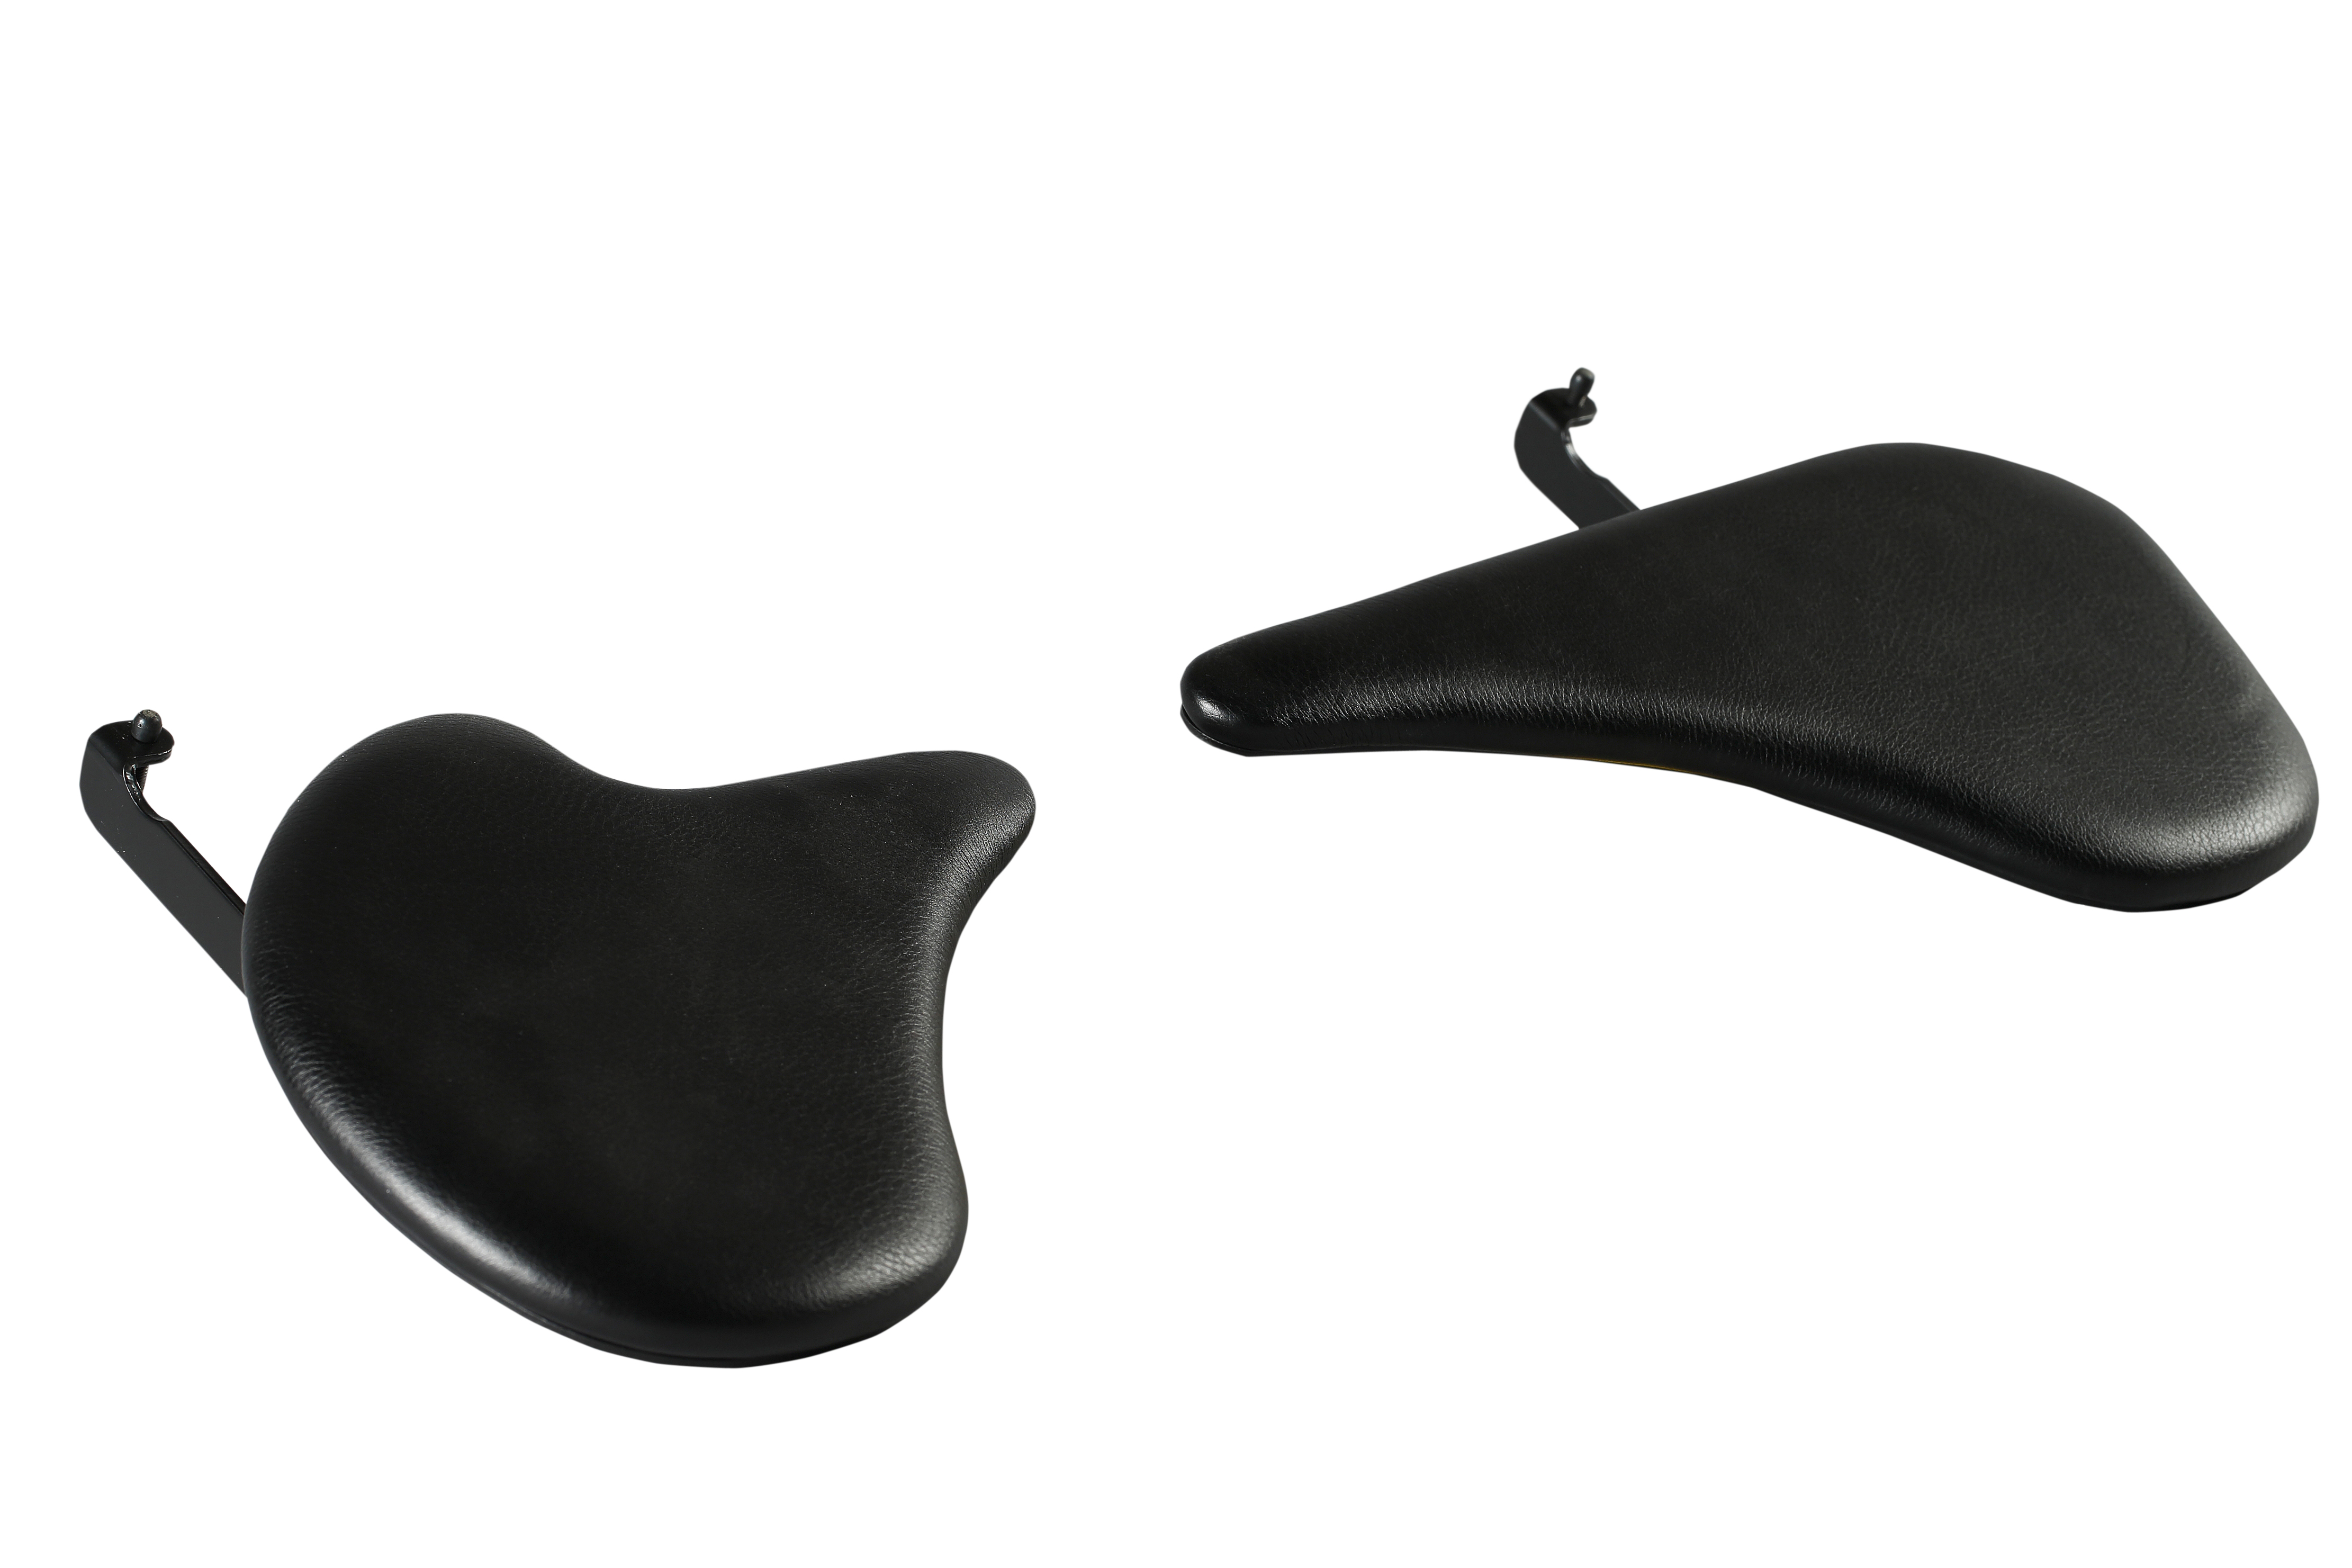 KENSON Underarmstøtte Duo, mest fleksible underarmstøtte i